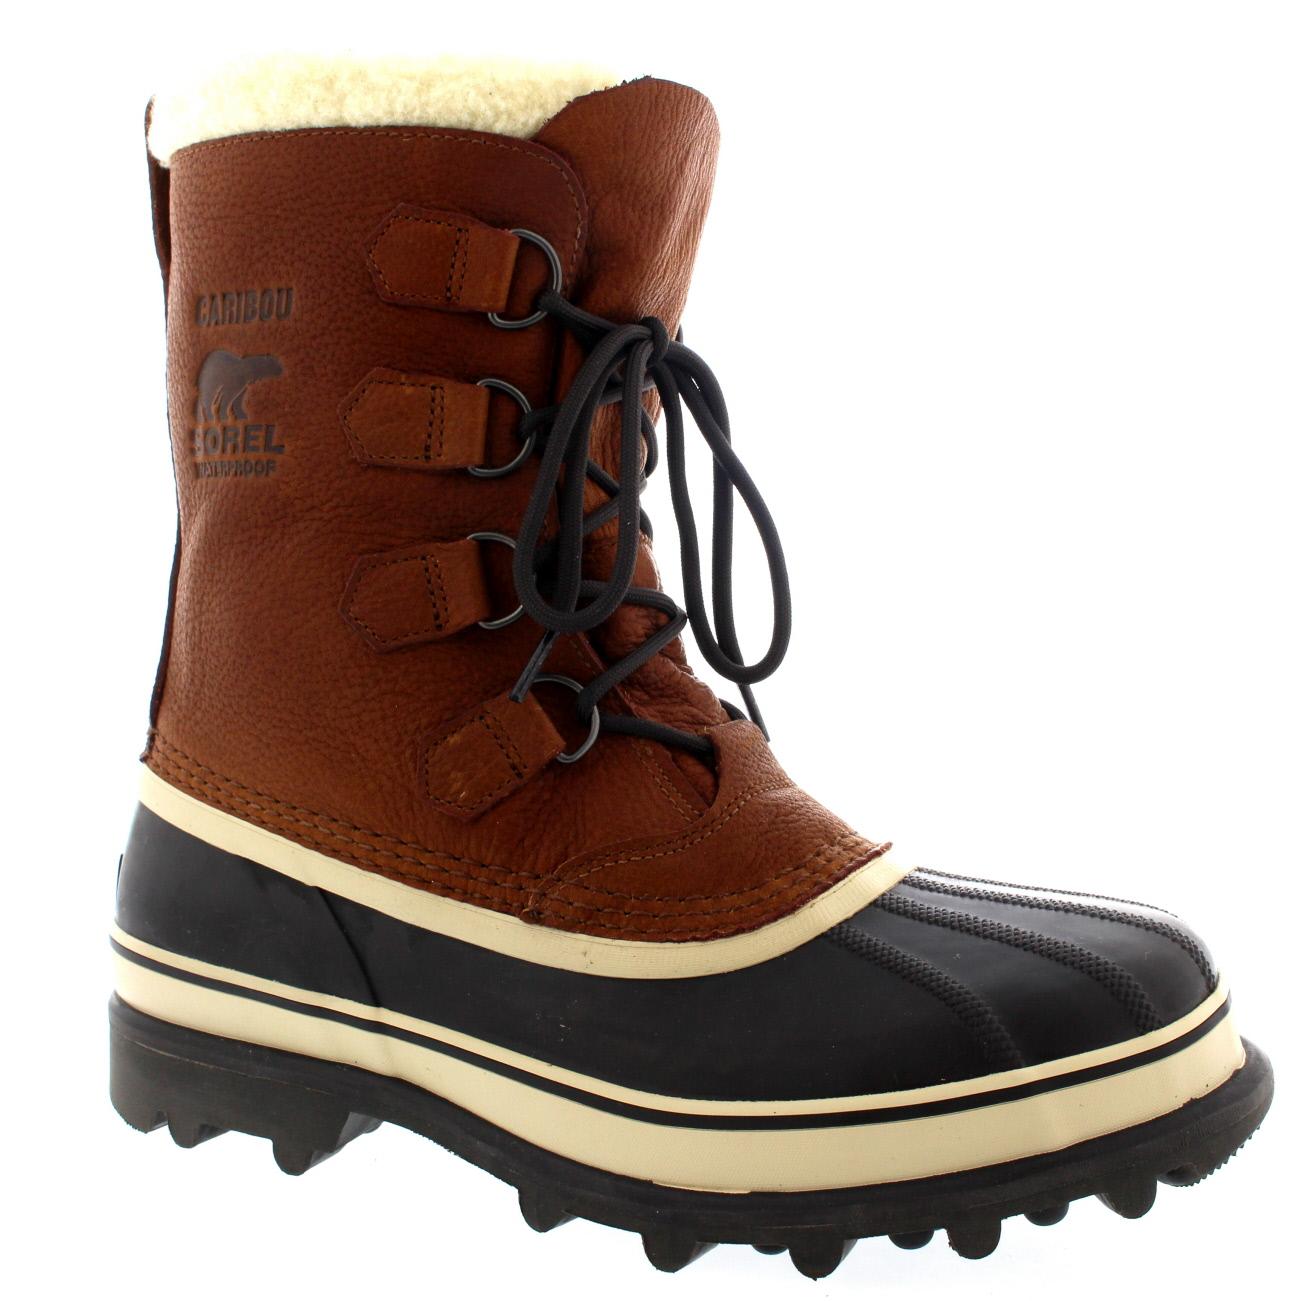 Sorel Caribou Leather